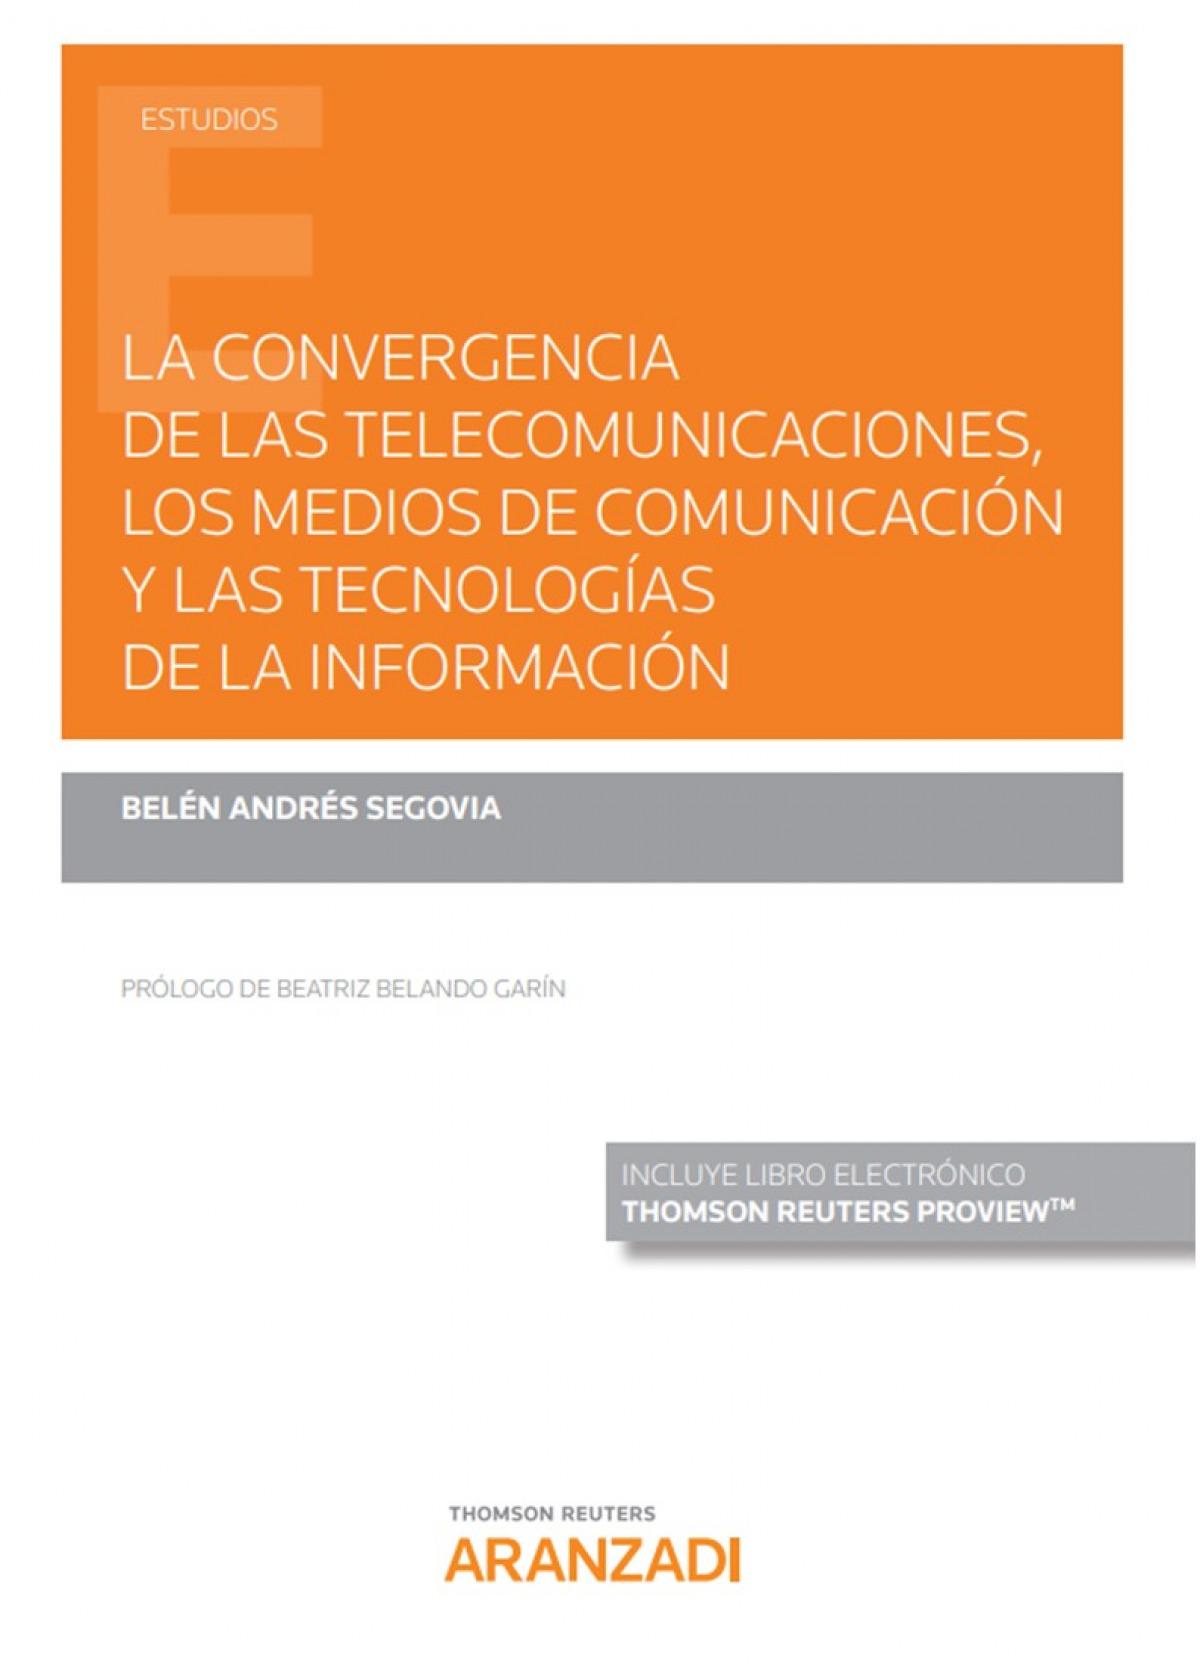 CONVERGENCIA TELECOMUNICACIONES MEDIOS COMUNICACION TECNOLO